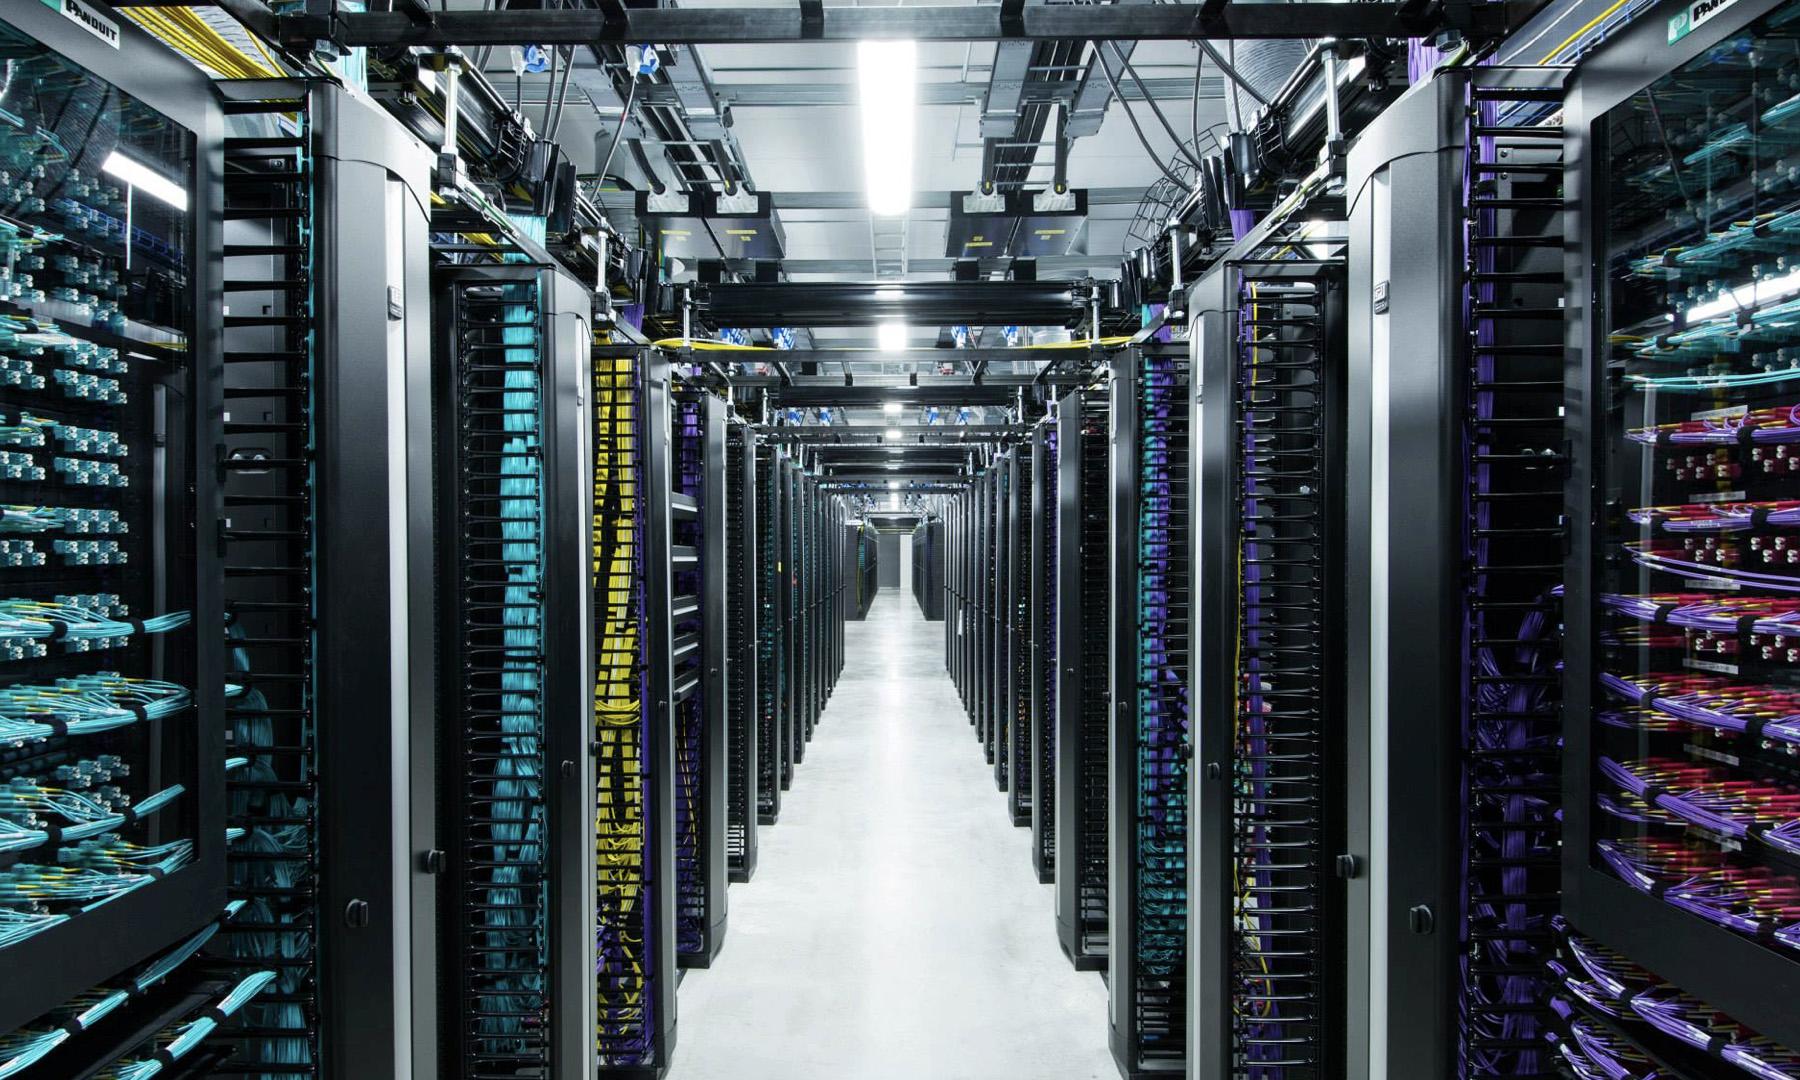 Introducing data center fabric, the next-generation Facebook data center  network - Facebook Engineering